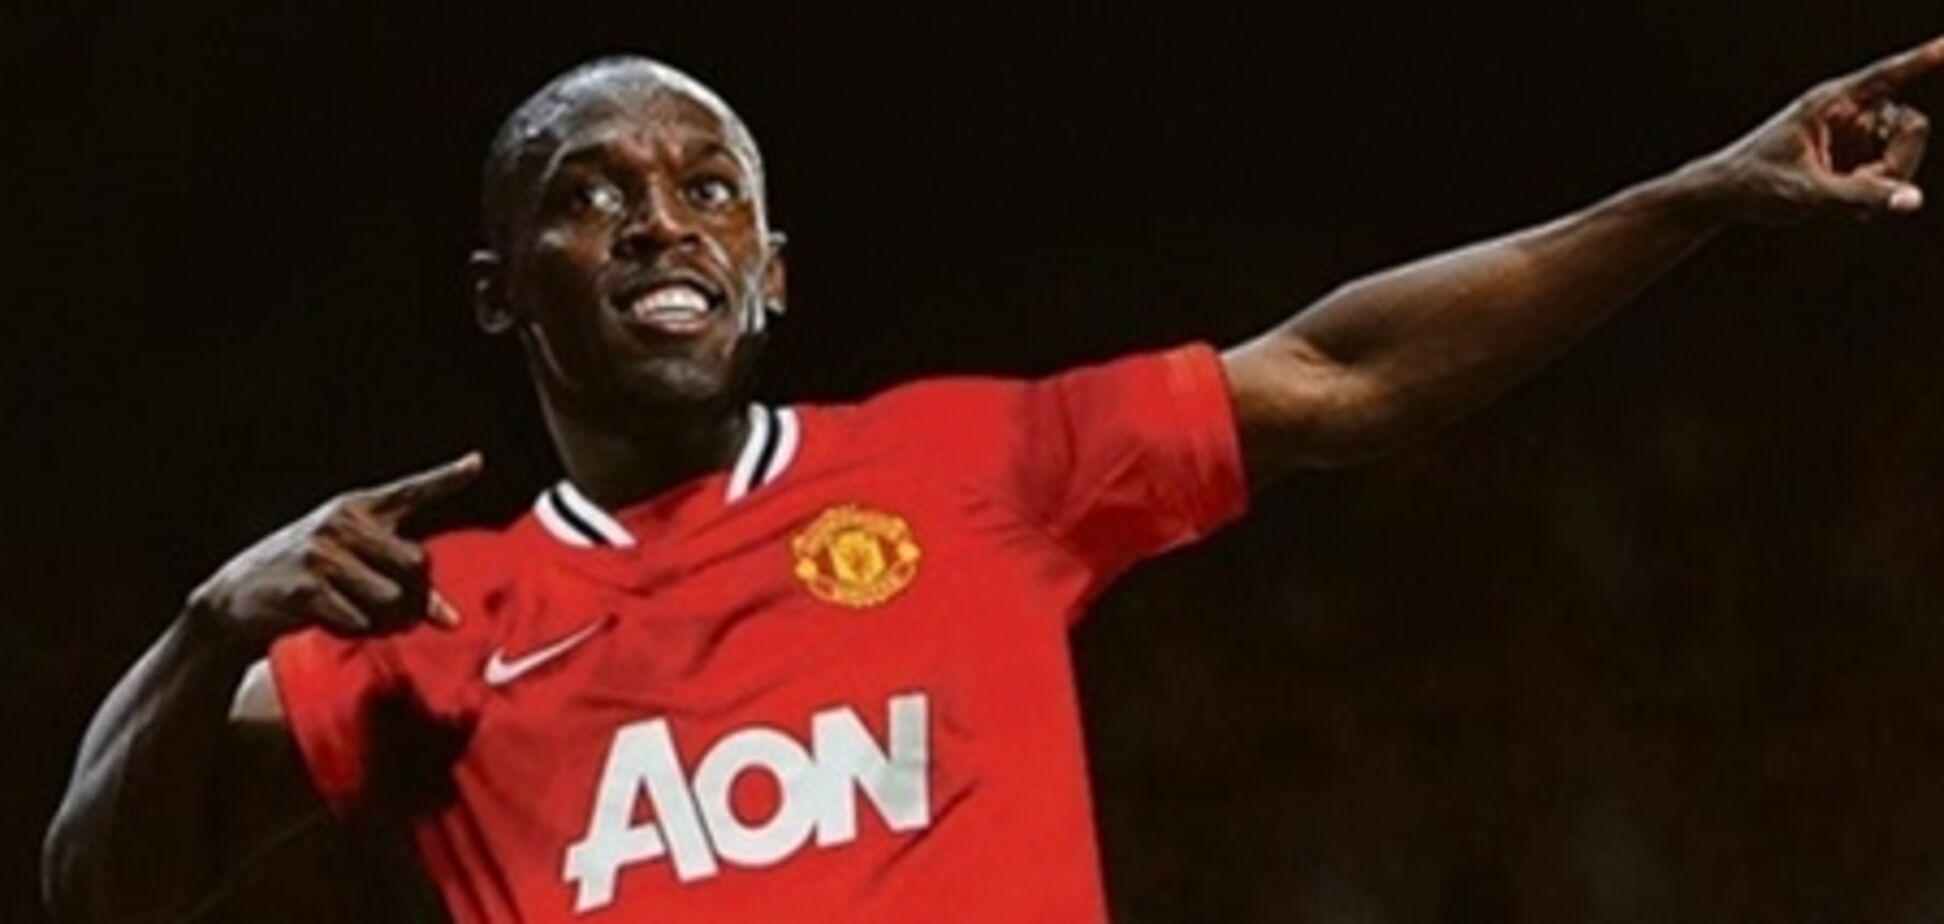 Самый быстрый человек планеты сыграет за 'Манчестер Юнайтед'